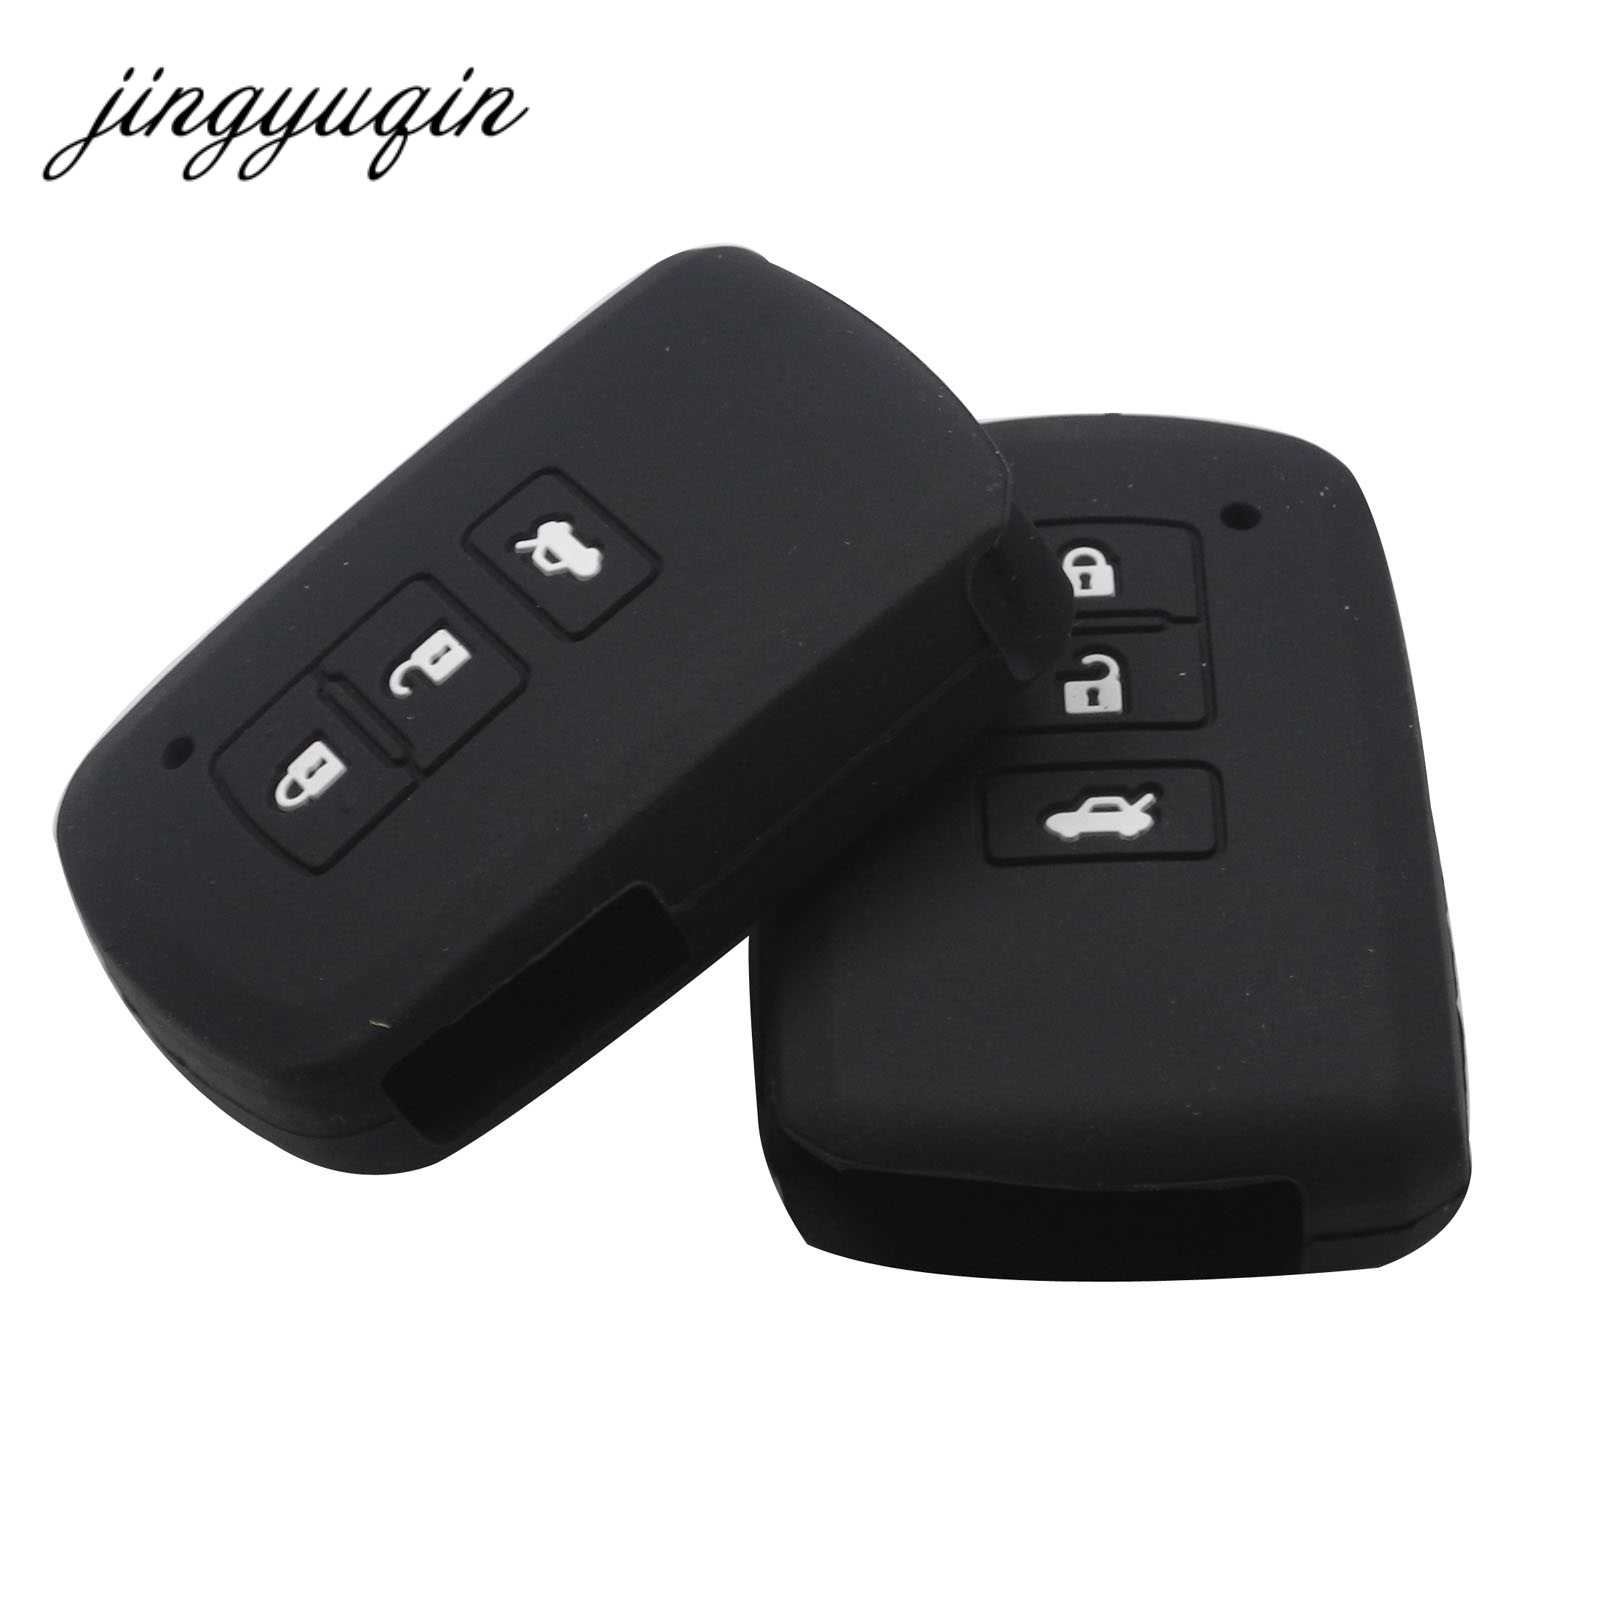 Jingyuqin Nieuwe Siliconen Smart Key Case voor Toyota Camry 7 Highlander 3 Knop Slimme Auto Sleutel Cover